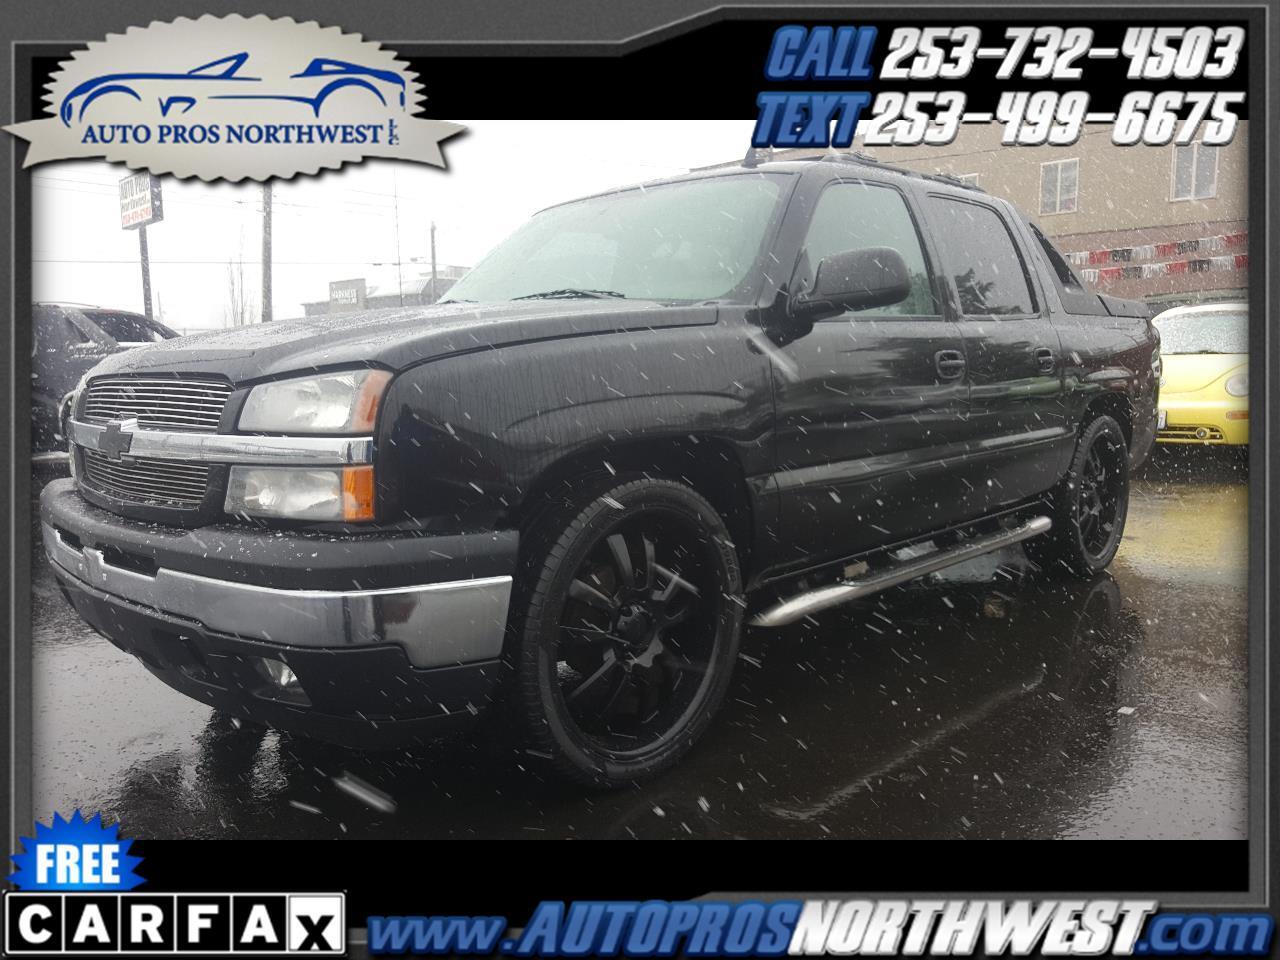 2006 Chevrolet Avalanche 1500 2WD